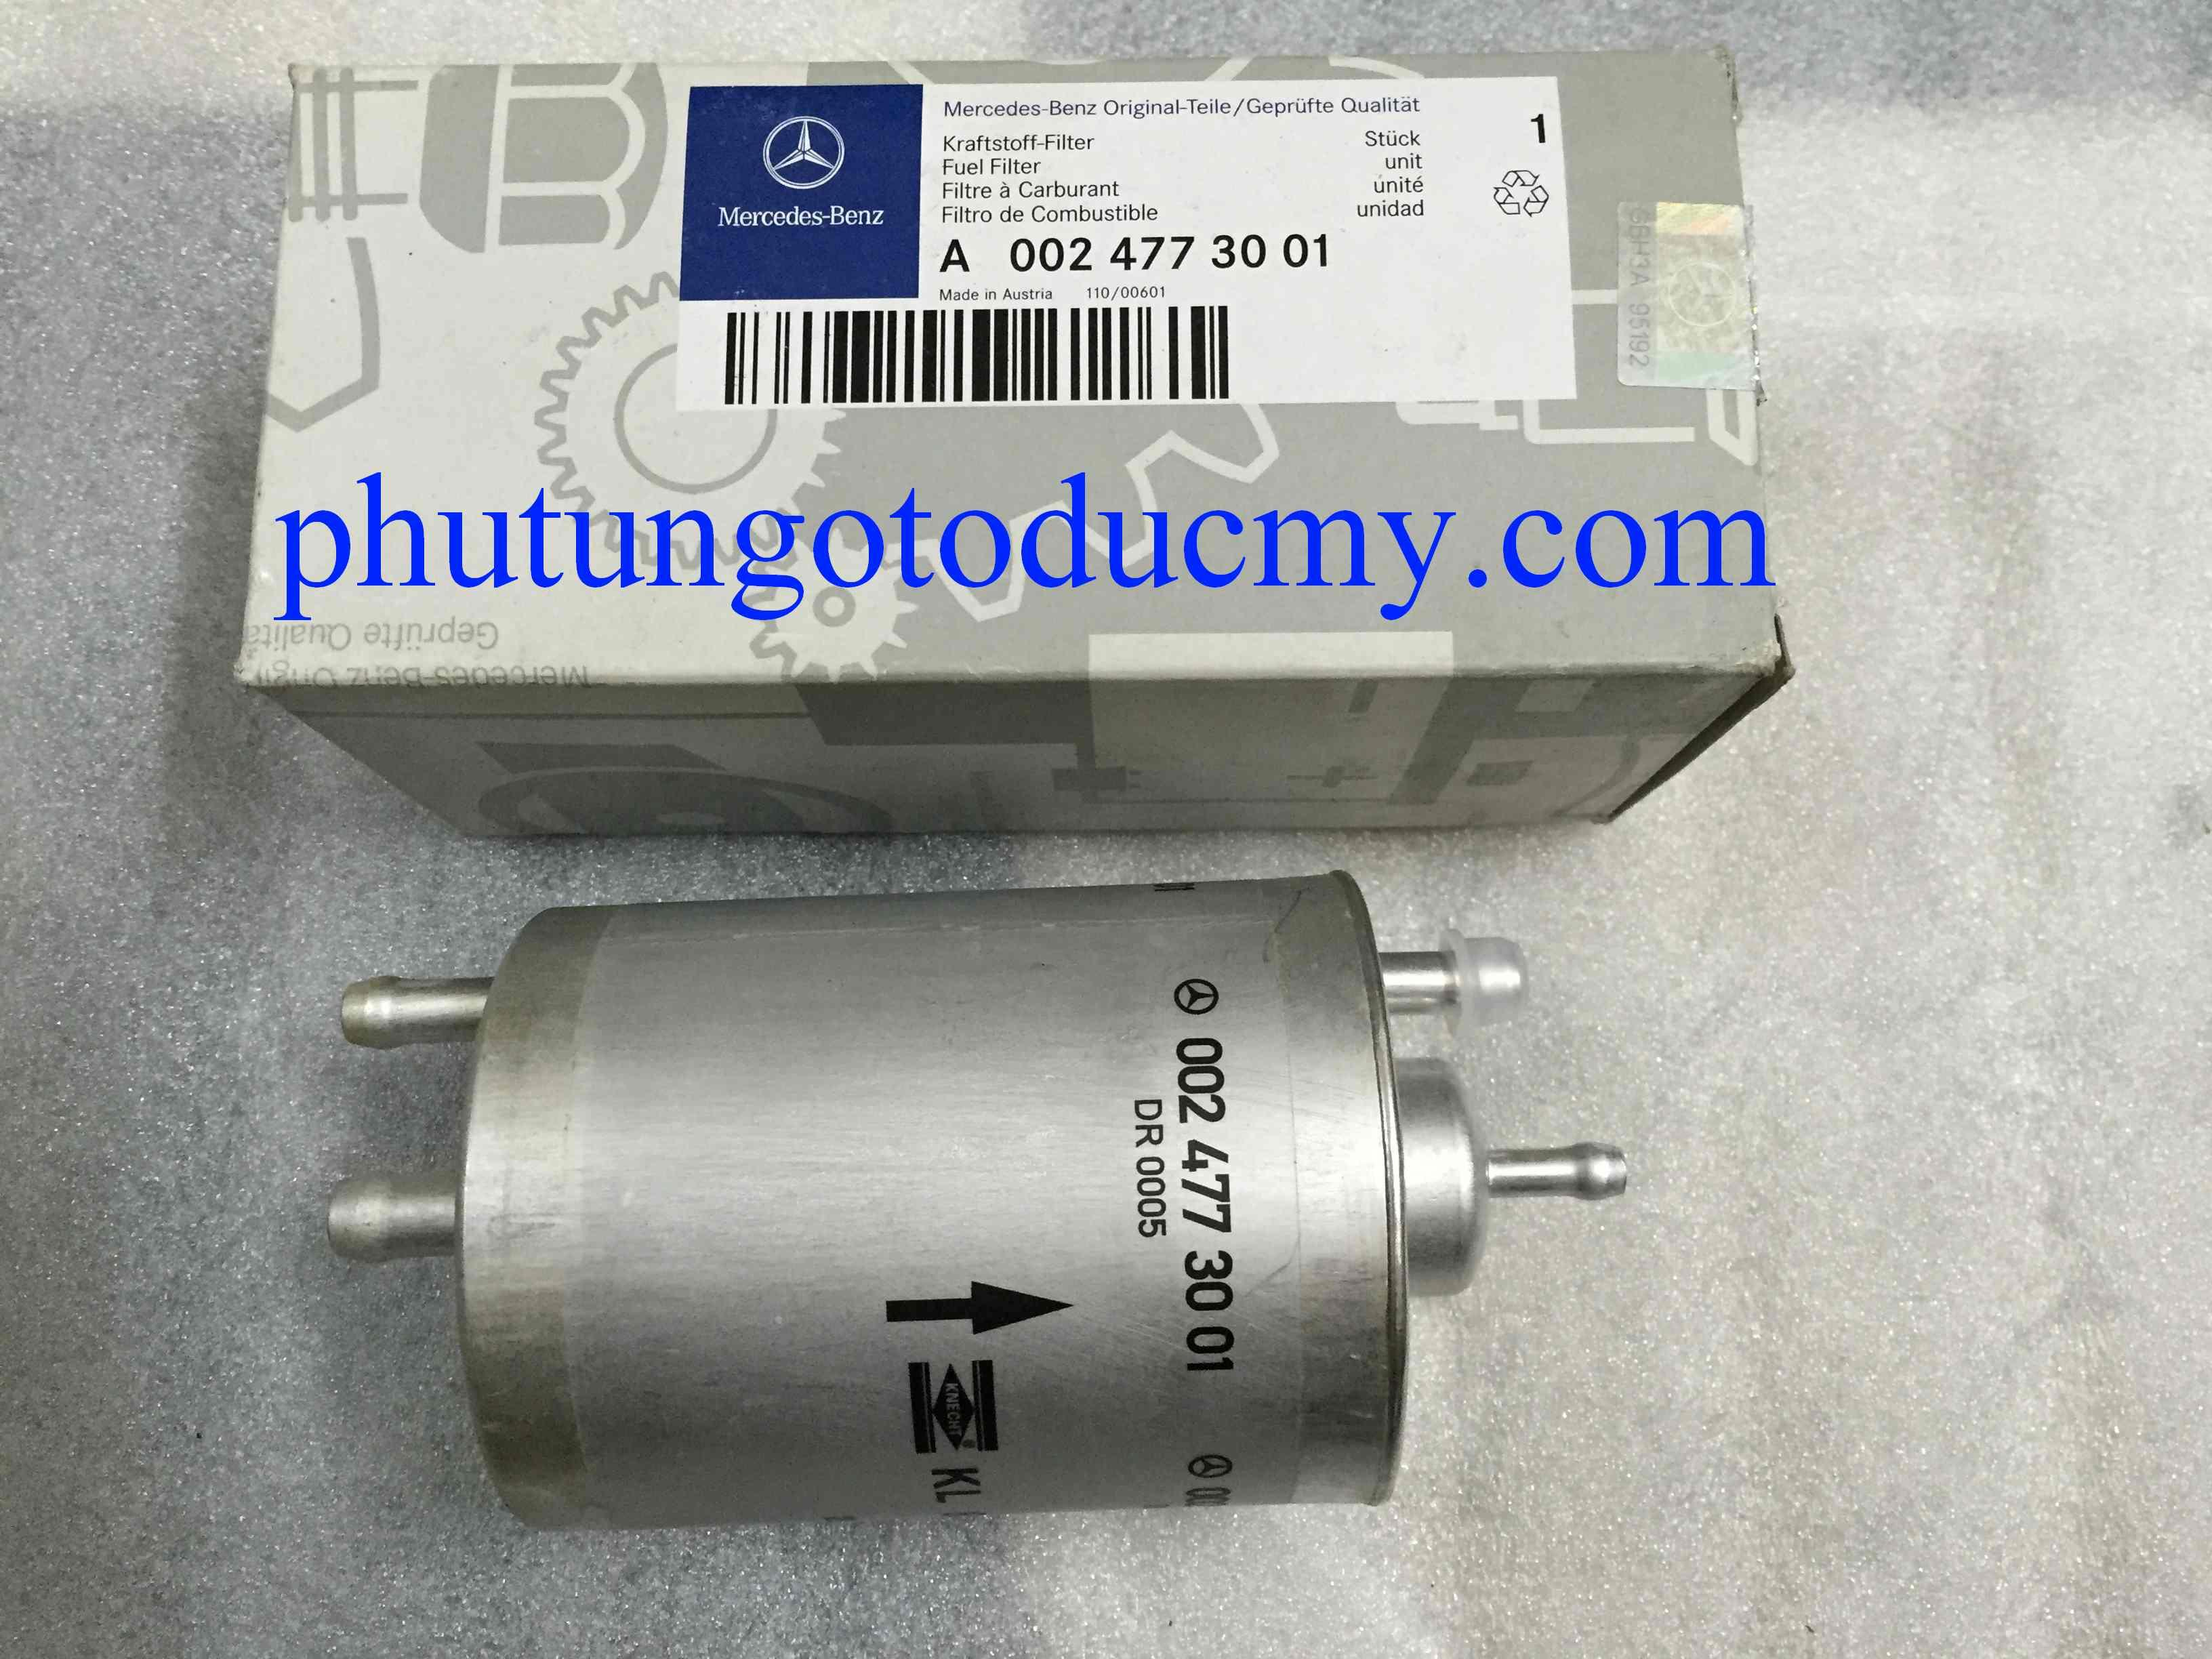 Lọc xăng Mercedes C180,C200,C240 W203- A0024773001